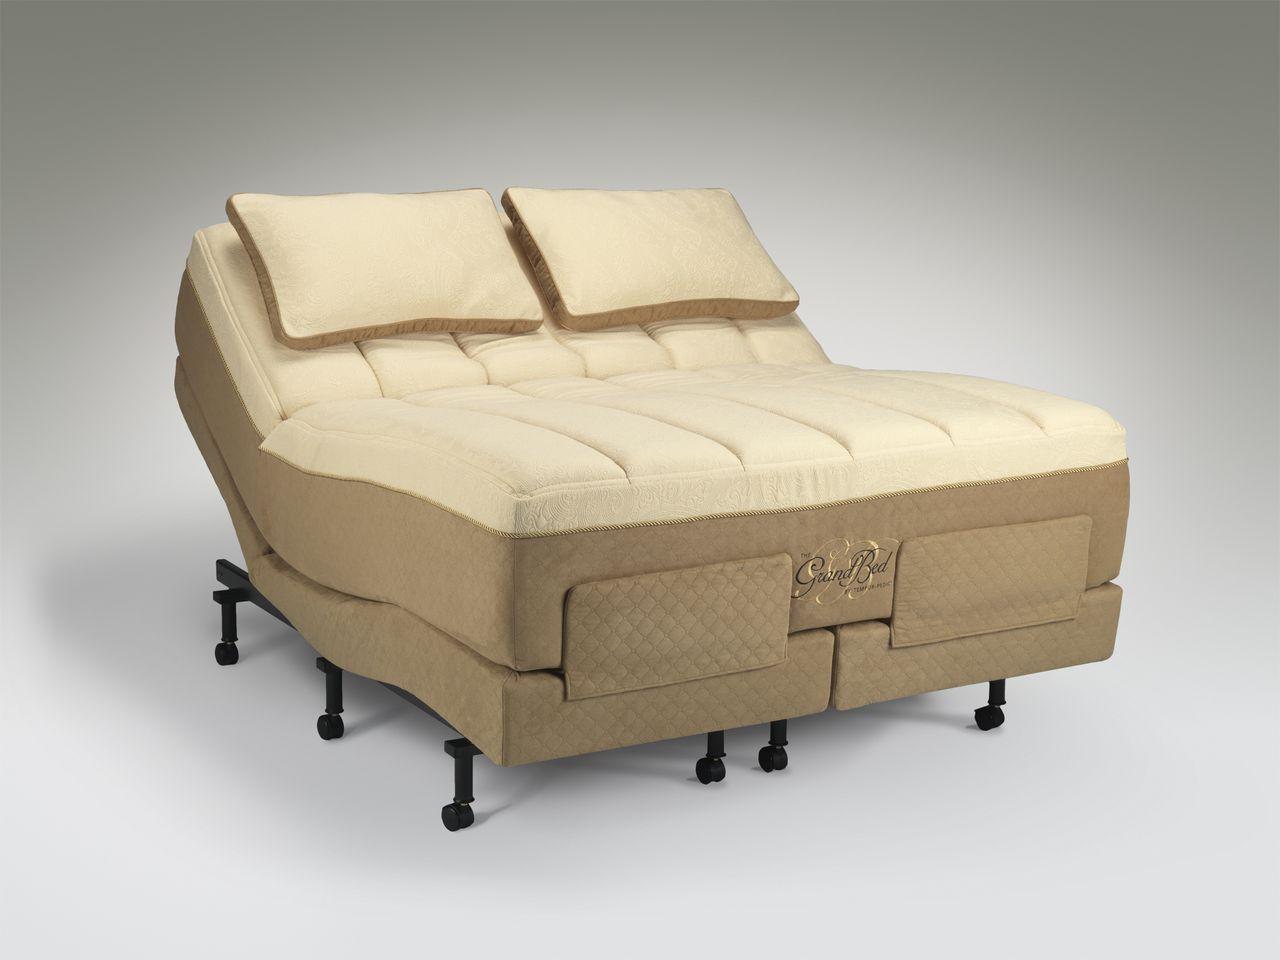 Original Mattress Factory Adjustable Bed Reviews